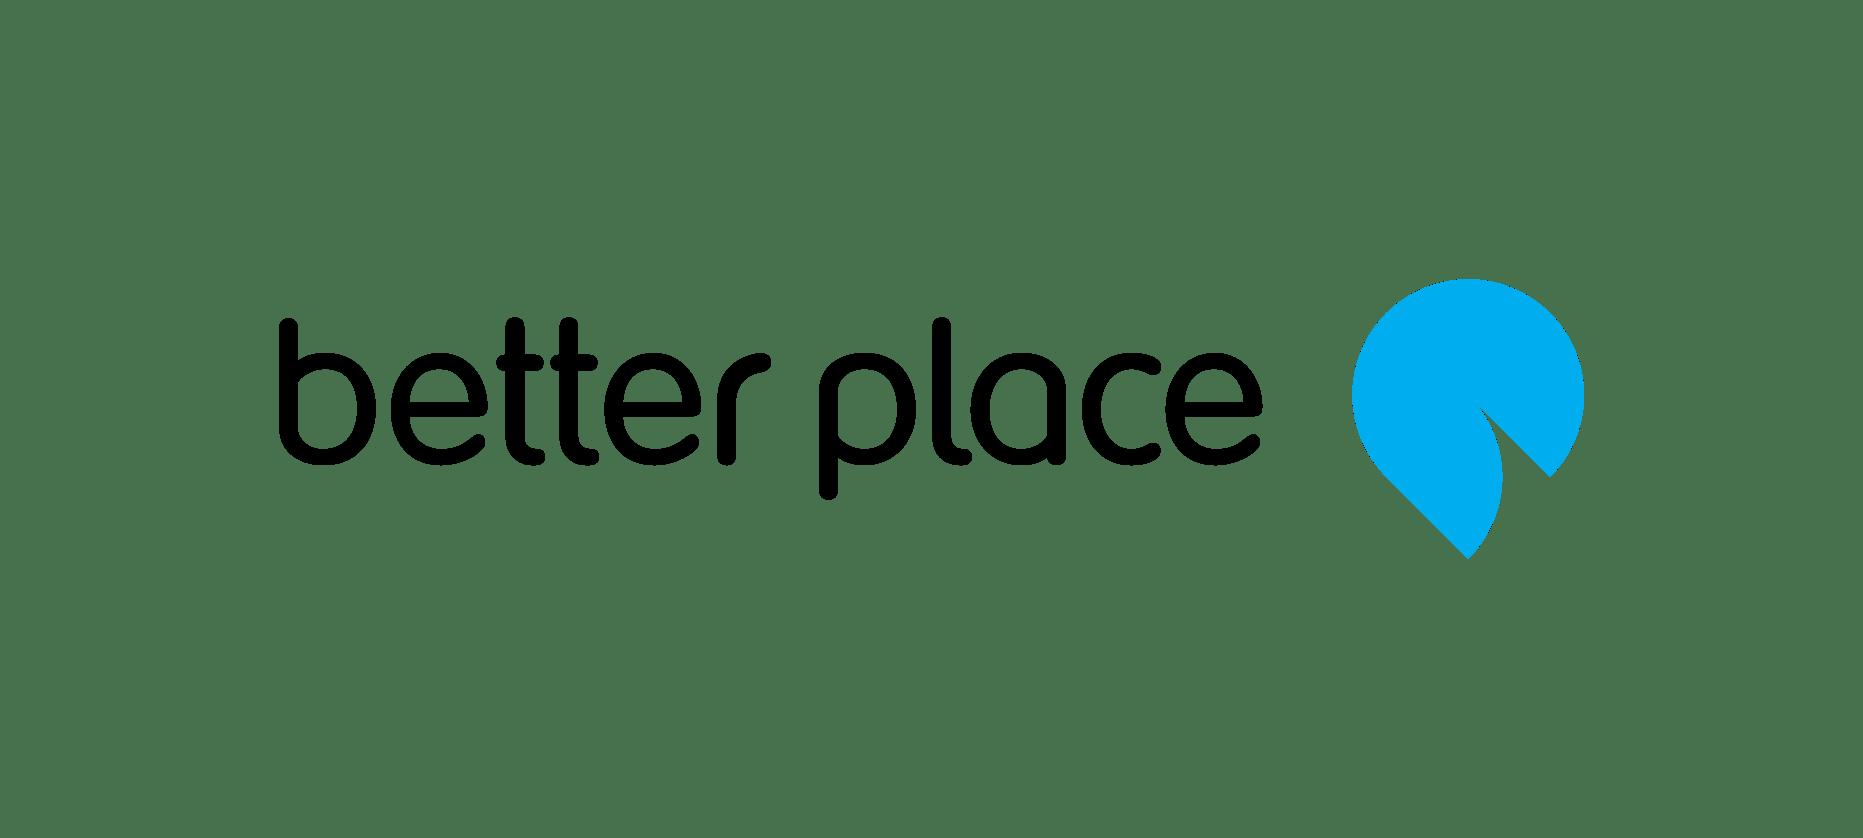 Better Place | Crunchbase